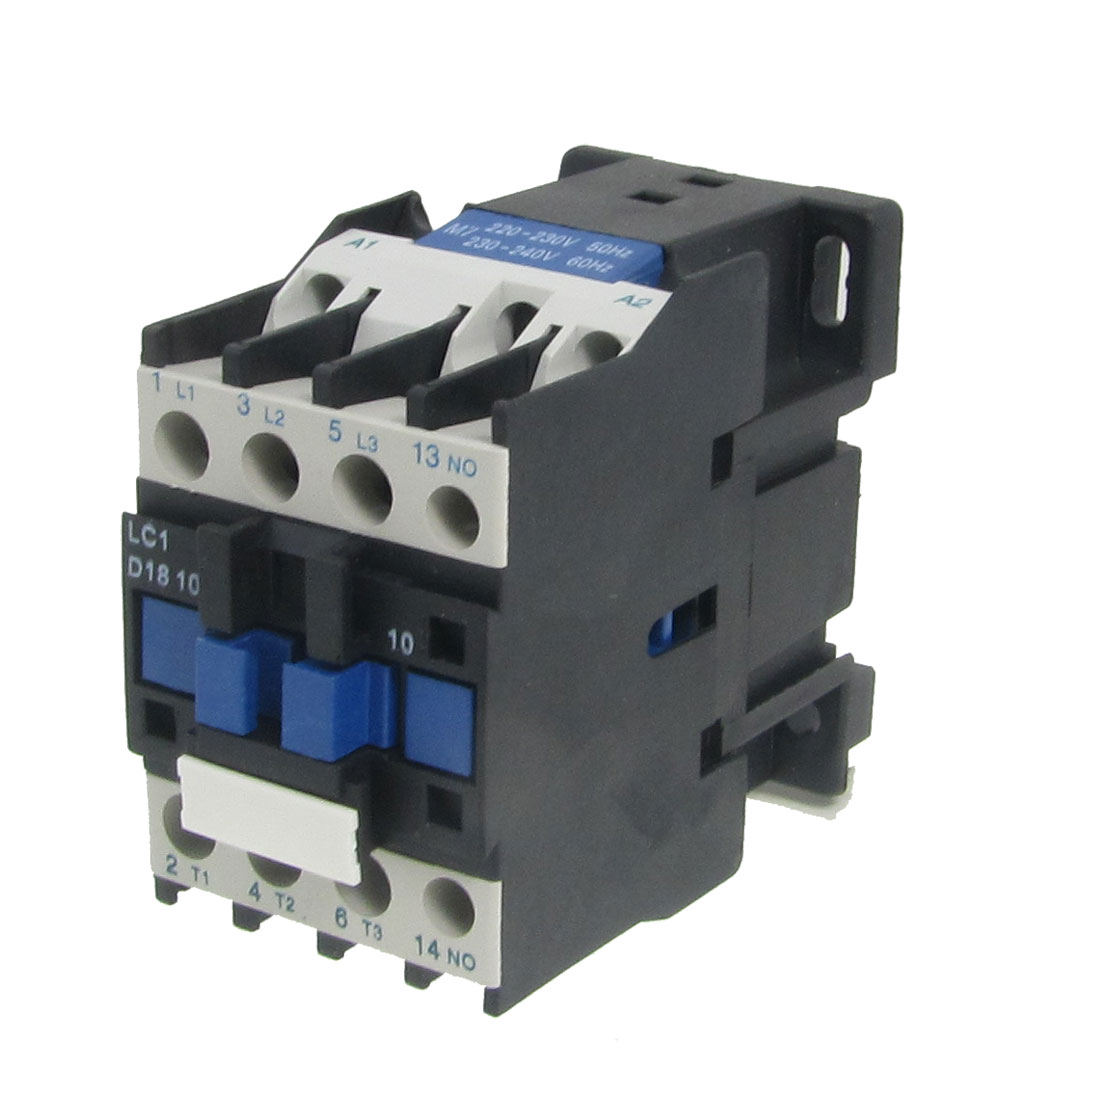 LC1D1810M7 Motor Control AC Contactor 32A 660V 3 Pole 220V Coil